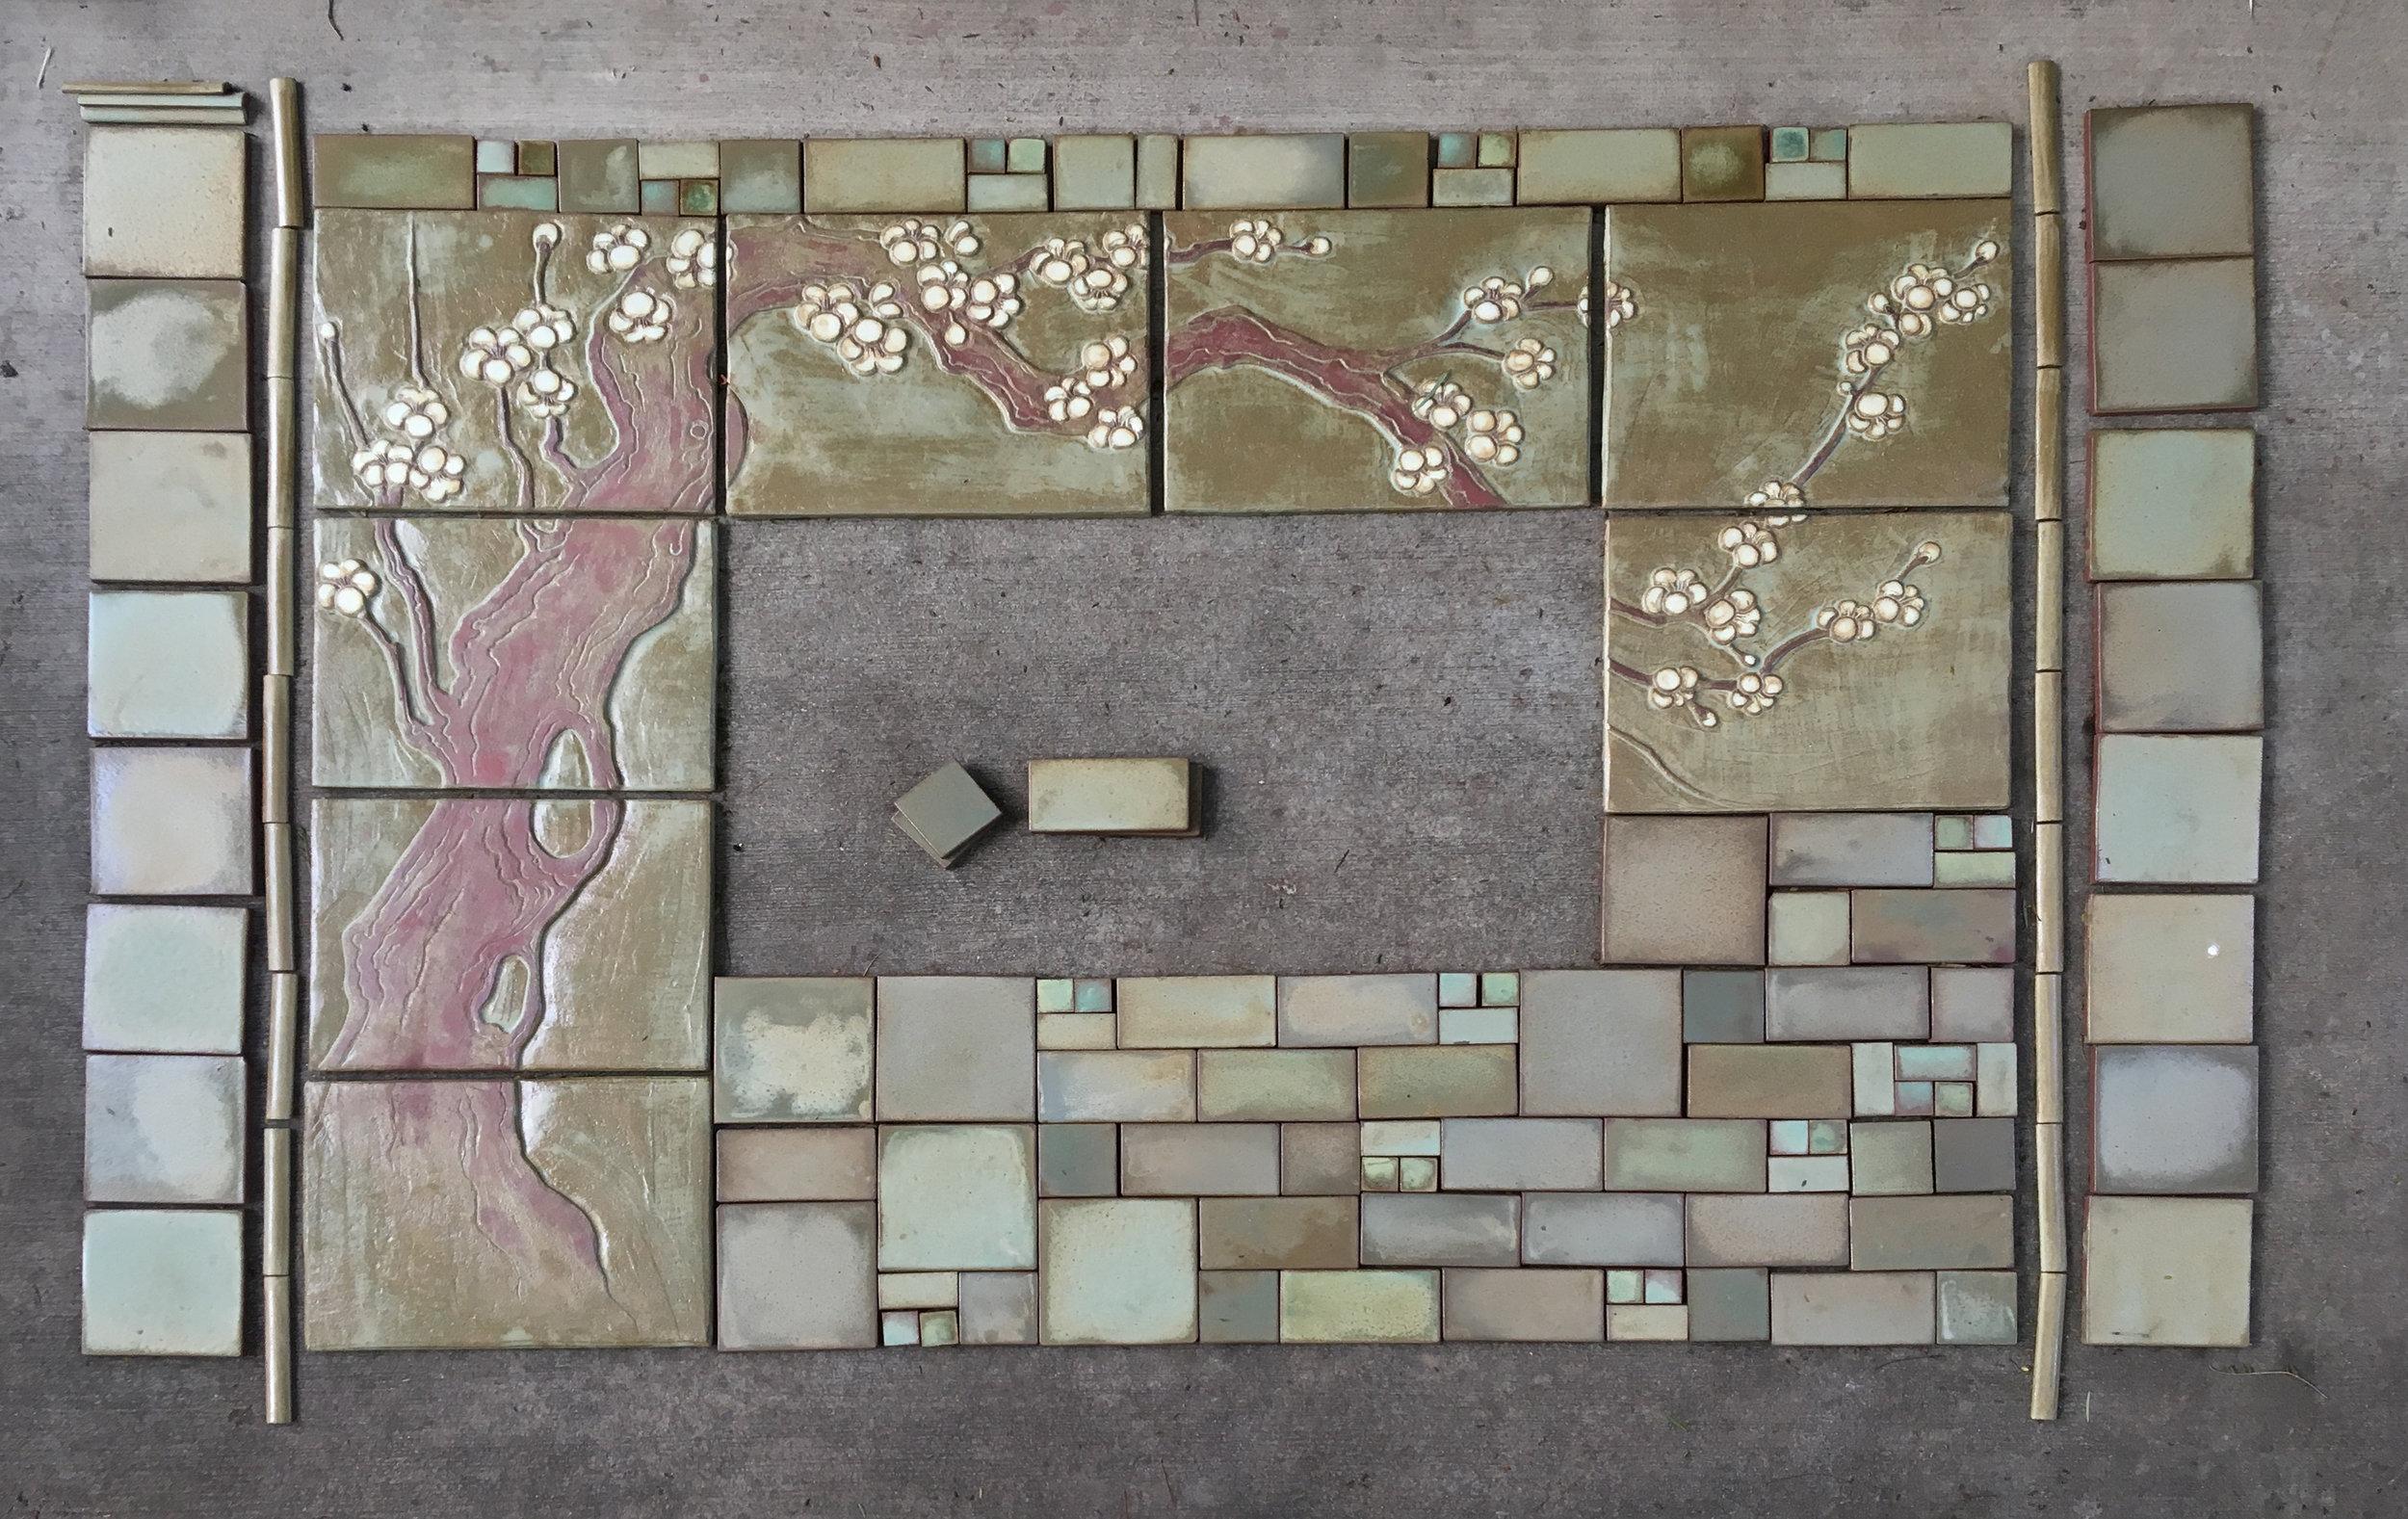 Sage Blend 1 Pasadena Craftsman Tile.jpg